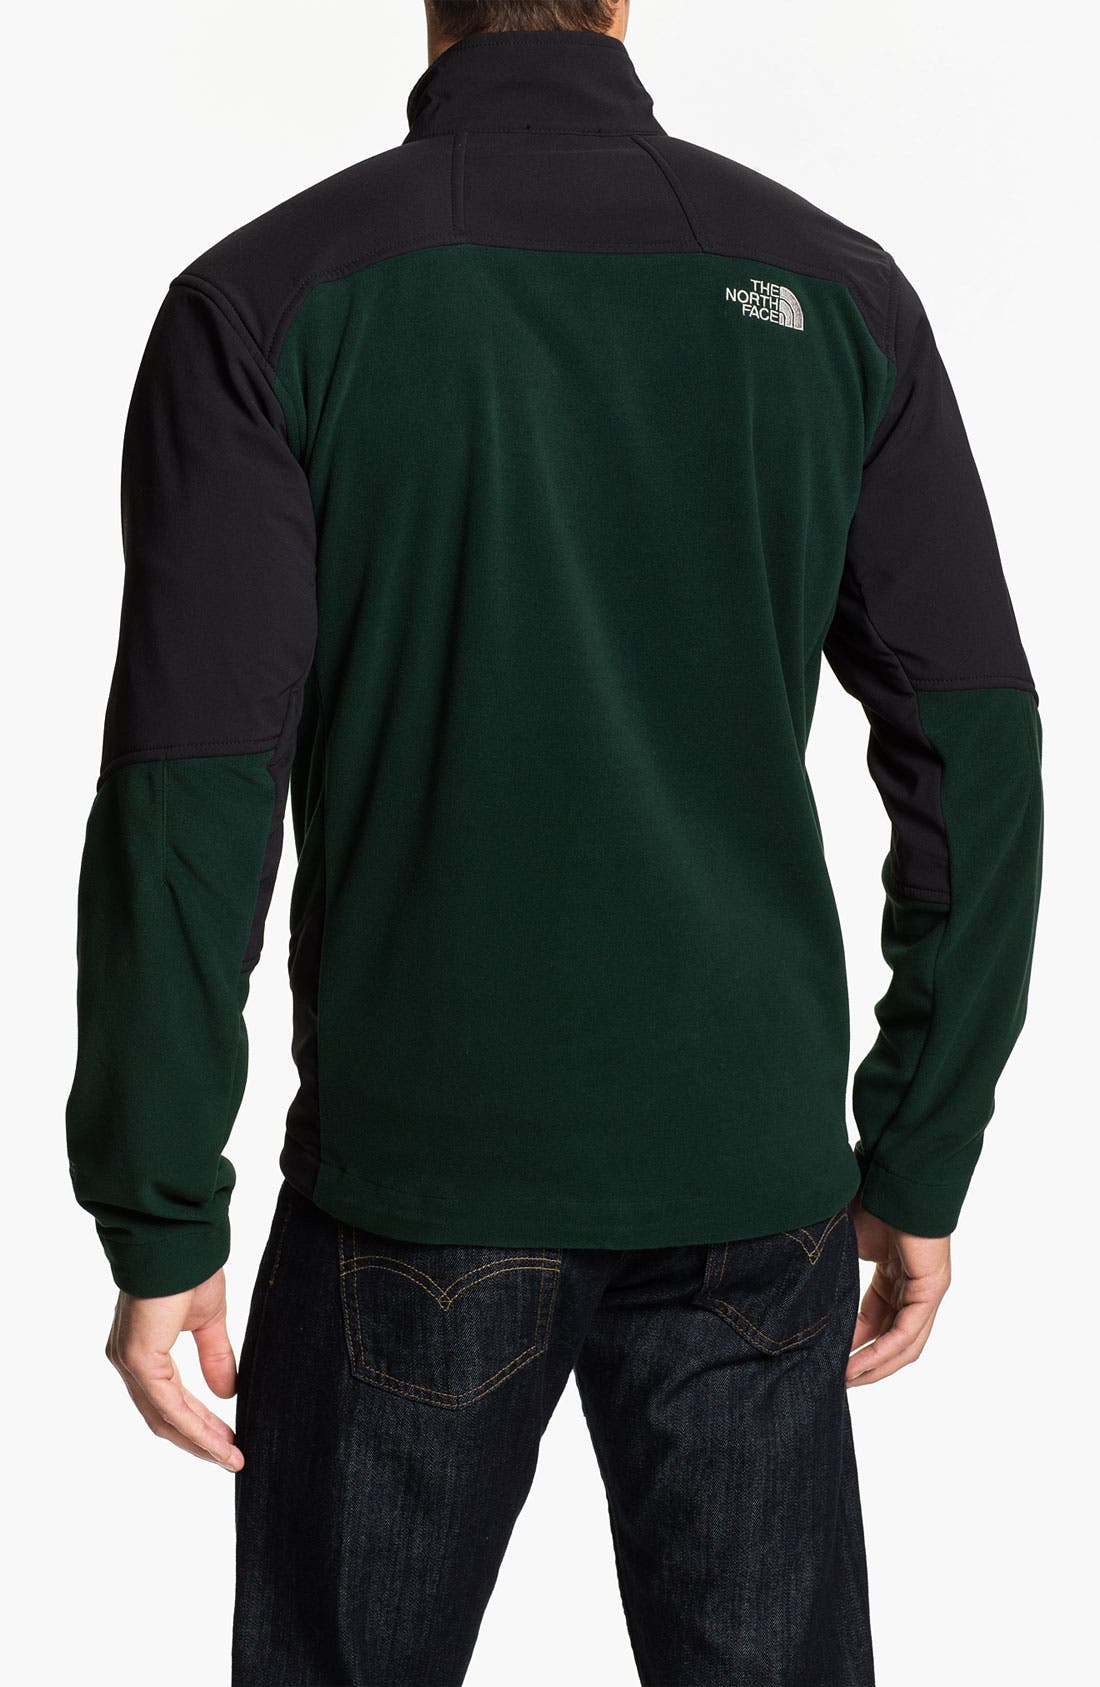 Alternate Image 2  - The North Face 'Pamir' GORE WINDSTOPPER® Fleece Jacket